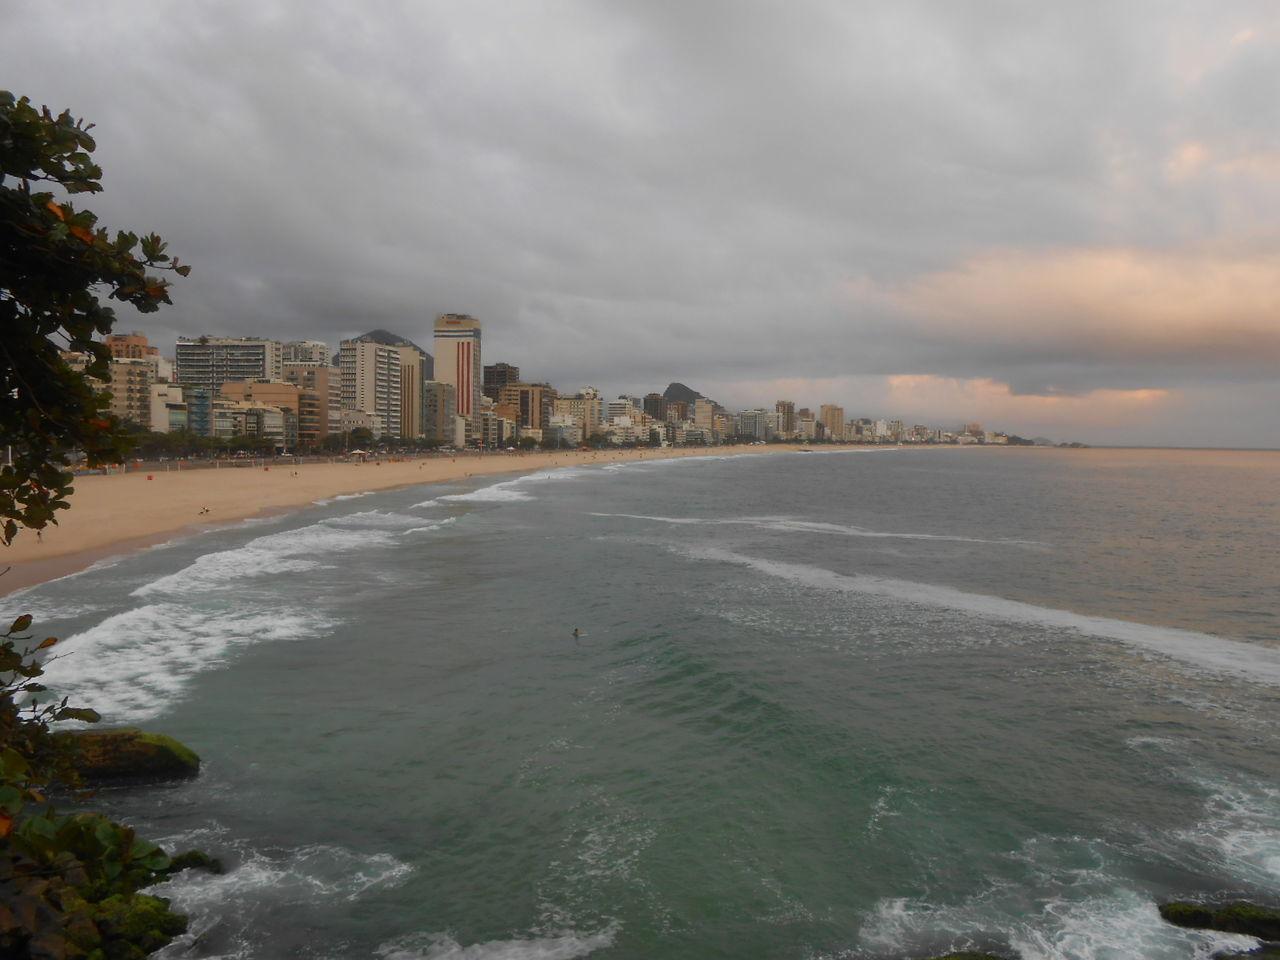 Traveling Home For The Holidays Leblon Beach Ipanema Beach Rio De Janeiro Beach Nature Cloud - Sky Sky Travel Destinations Day Cityscape Water Hot Water Landscape Clouds Environment